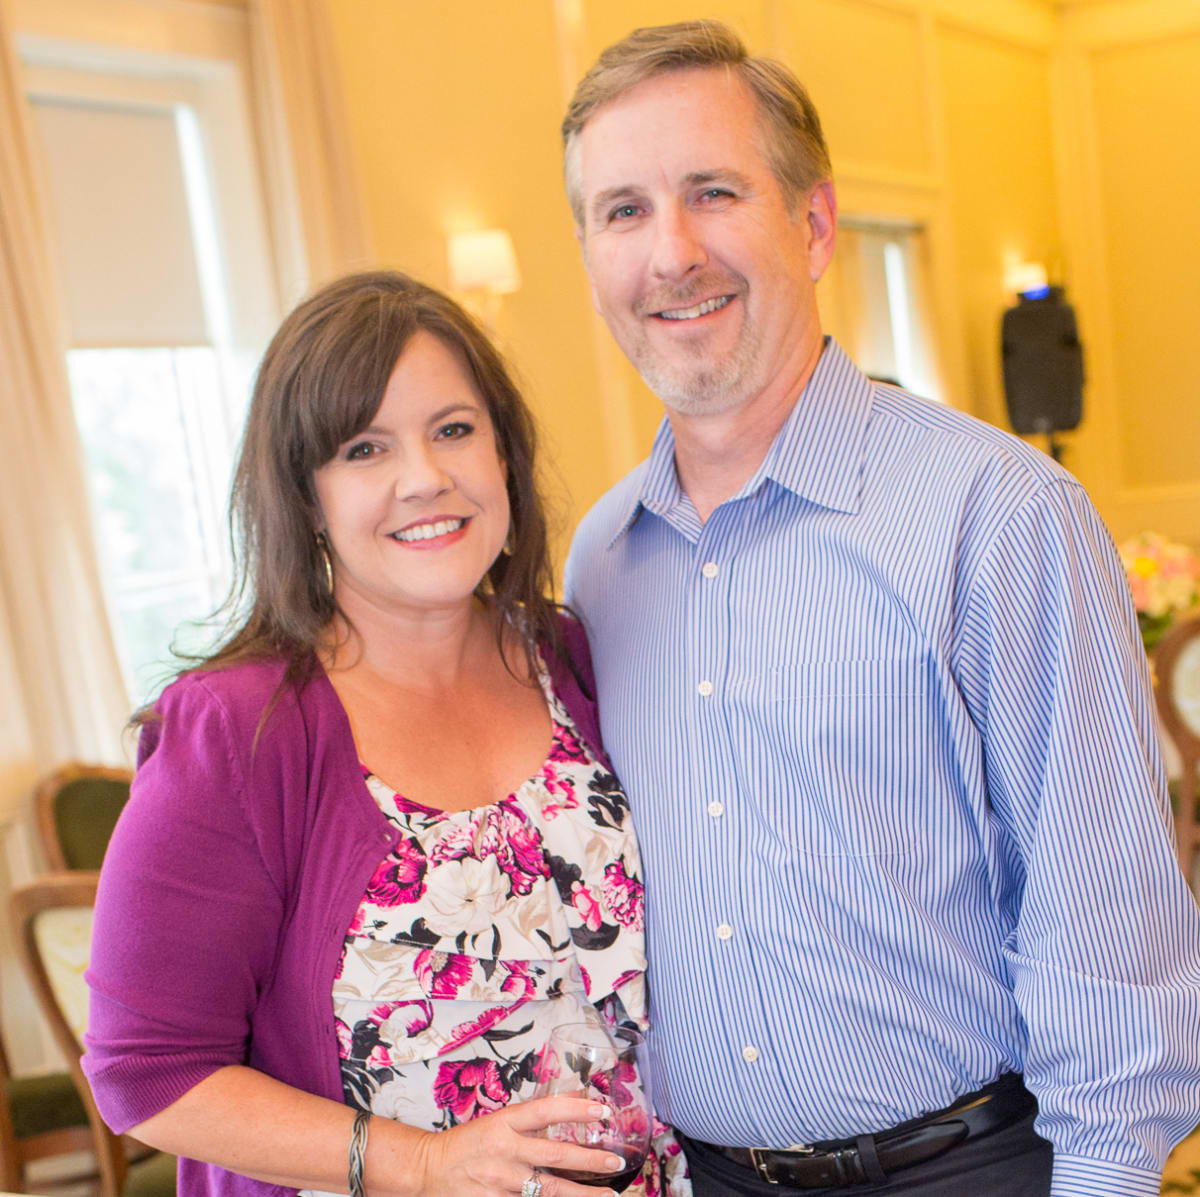 News, Shelby, Cheers 4 Charity kick-off, June 2015, Liz and Mark Livingston